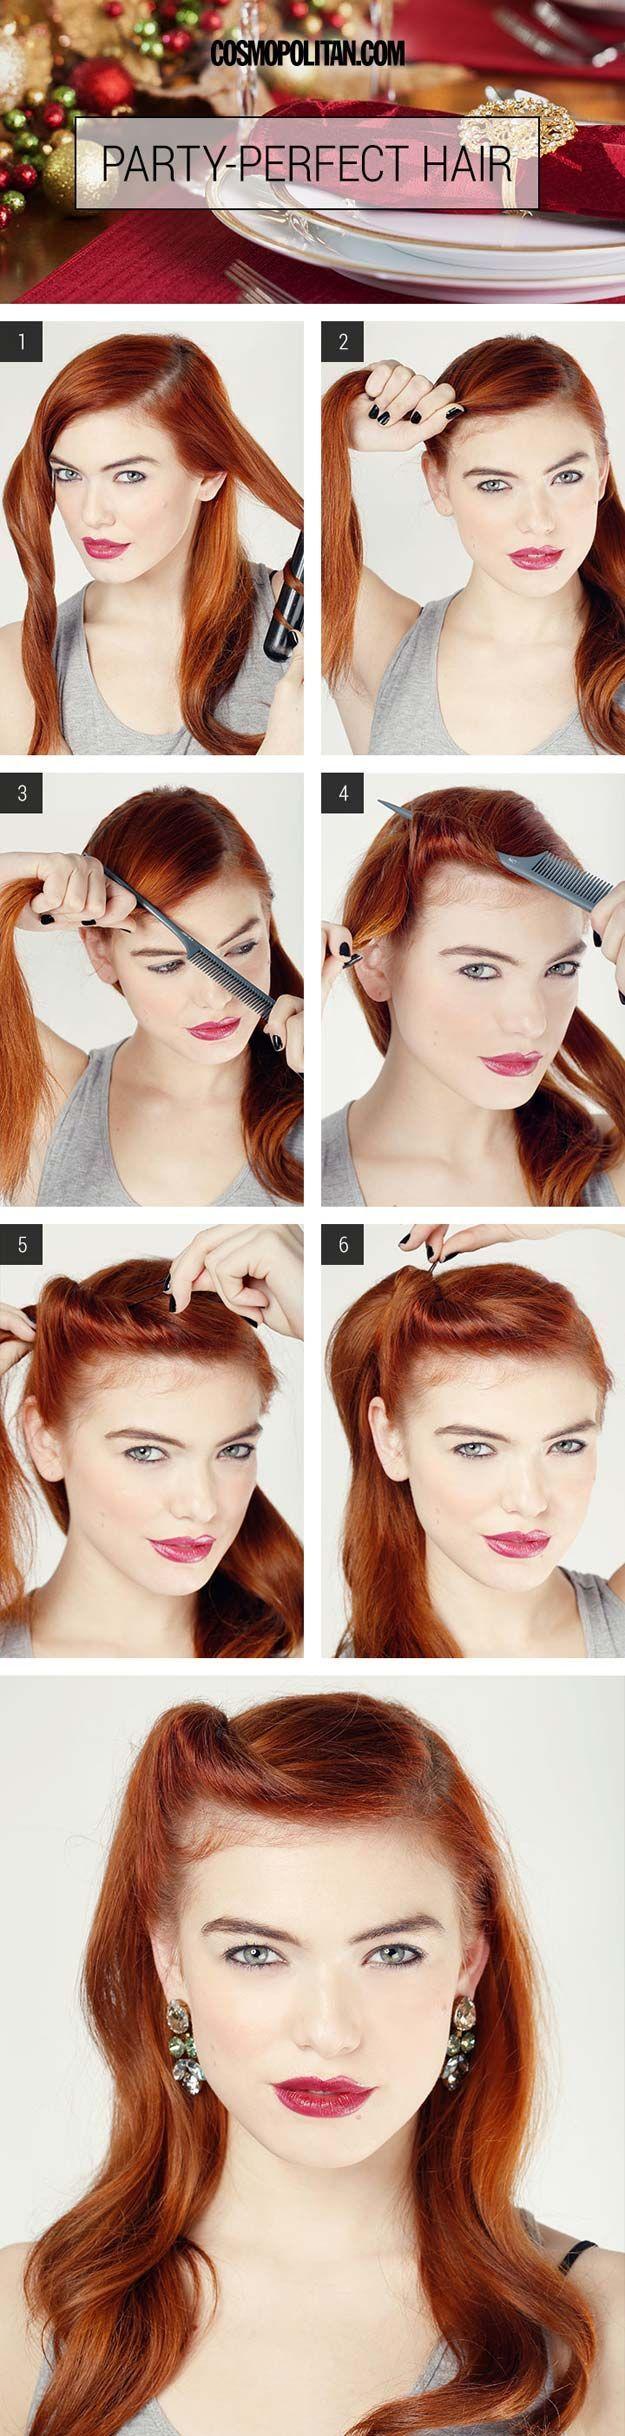 best hair u makeup images on pinterest make up looks beauty